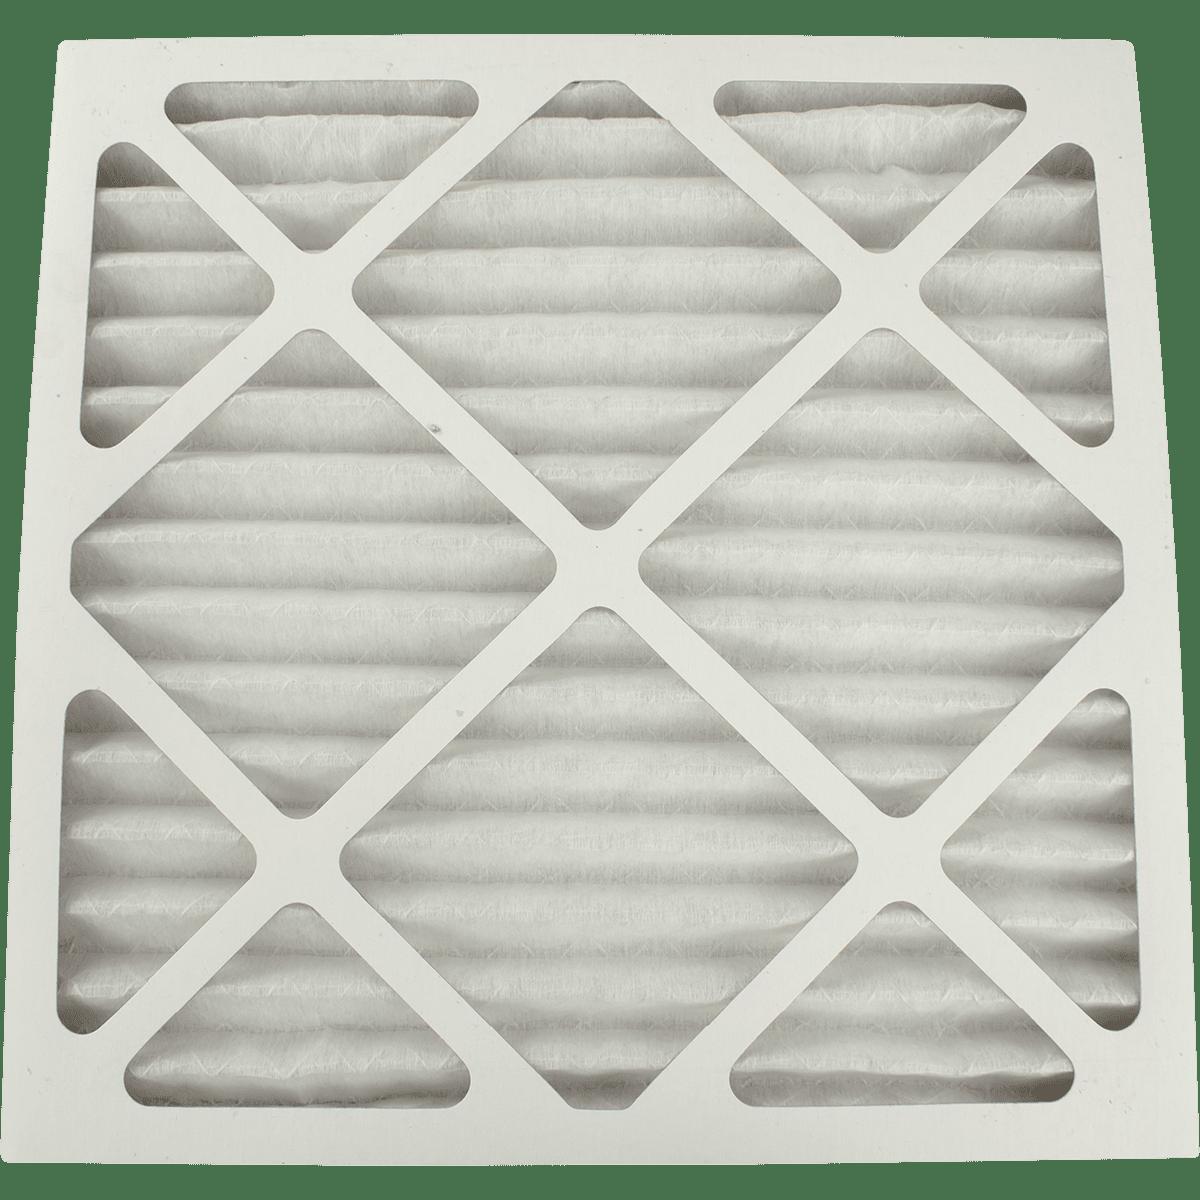 Viking Pre-Filter for IAQ7000 Air Scrubber vi5236